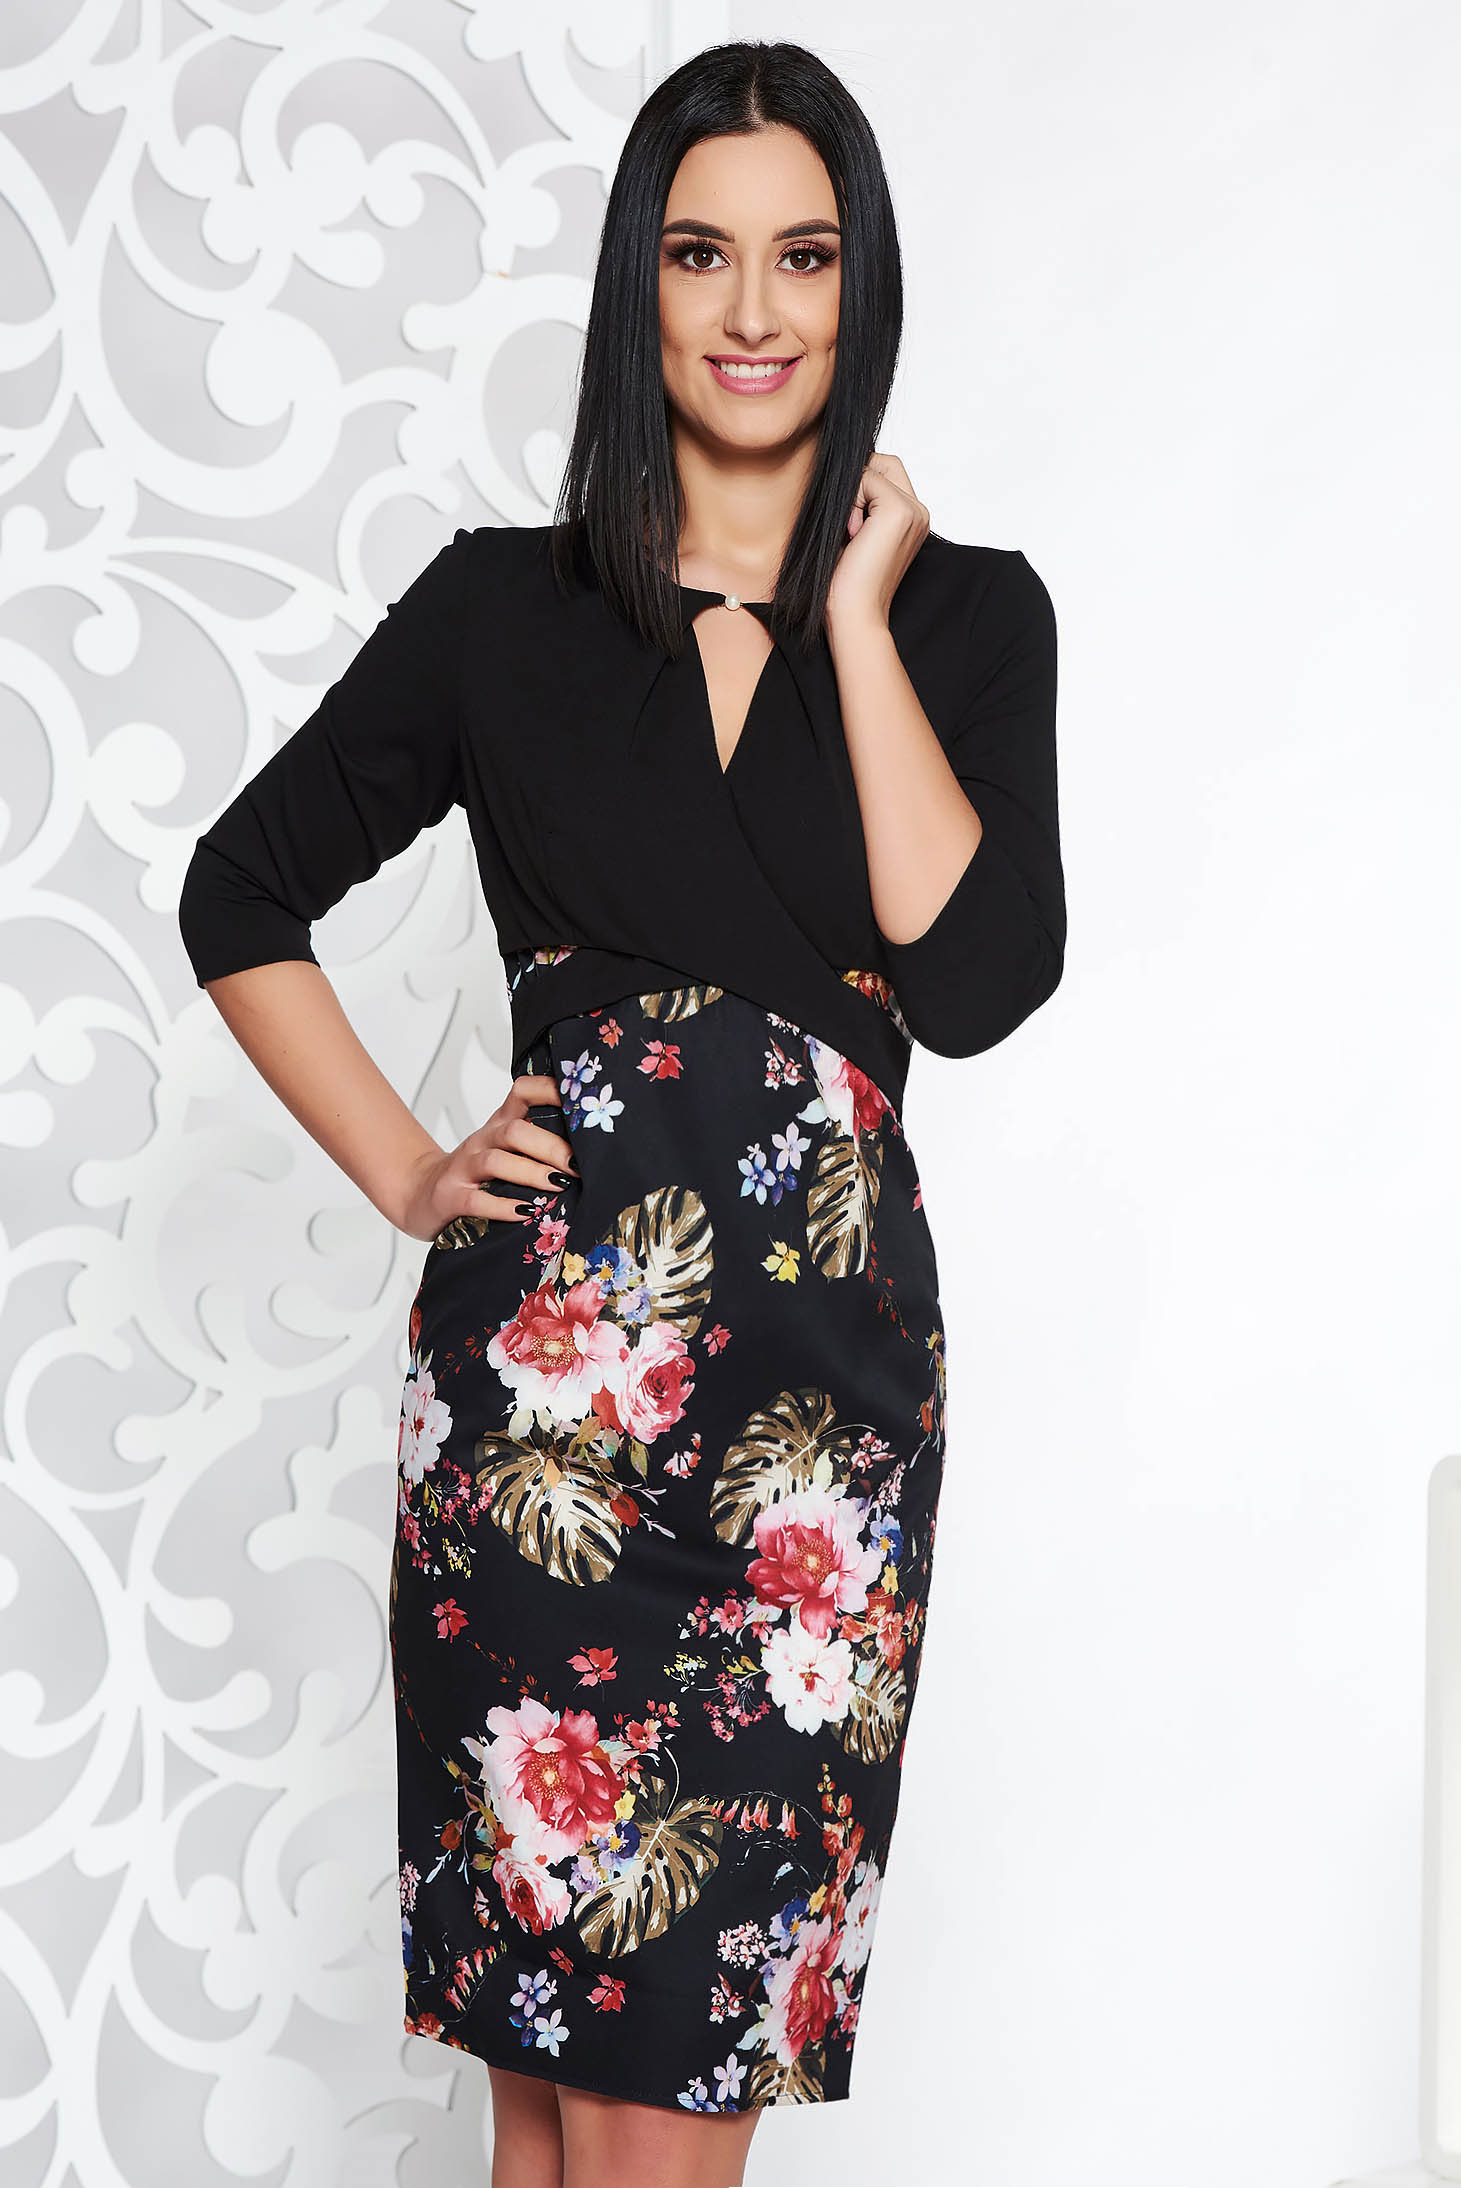 Rochie neagra eleganta tip creion din stofa usor elastica decupat la bust